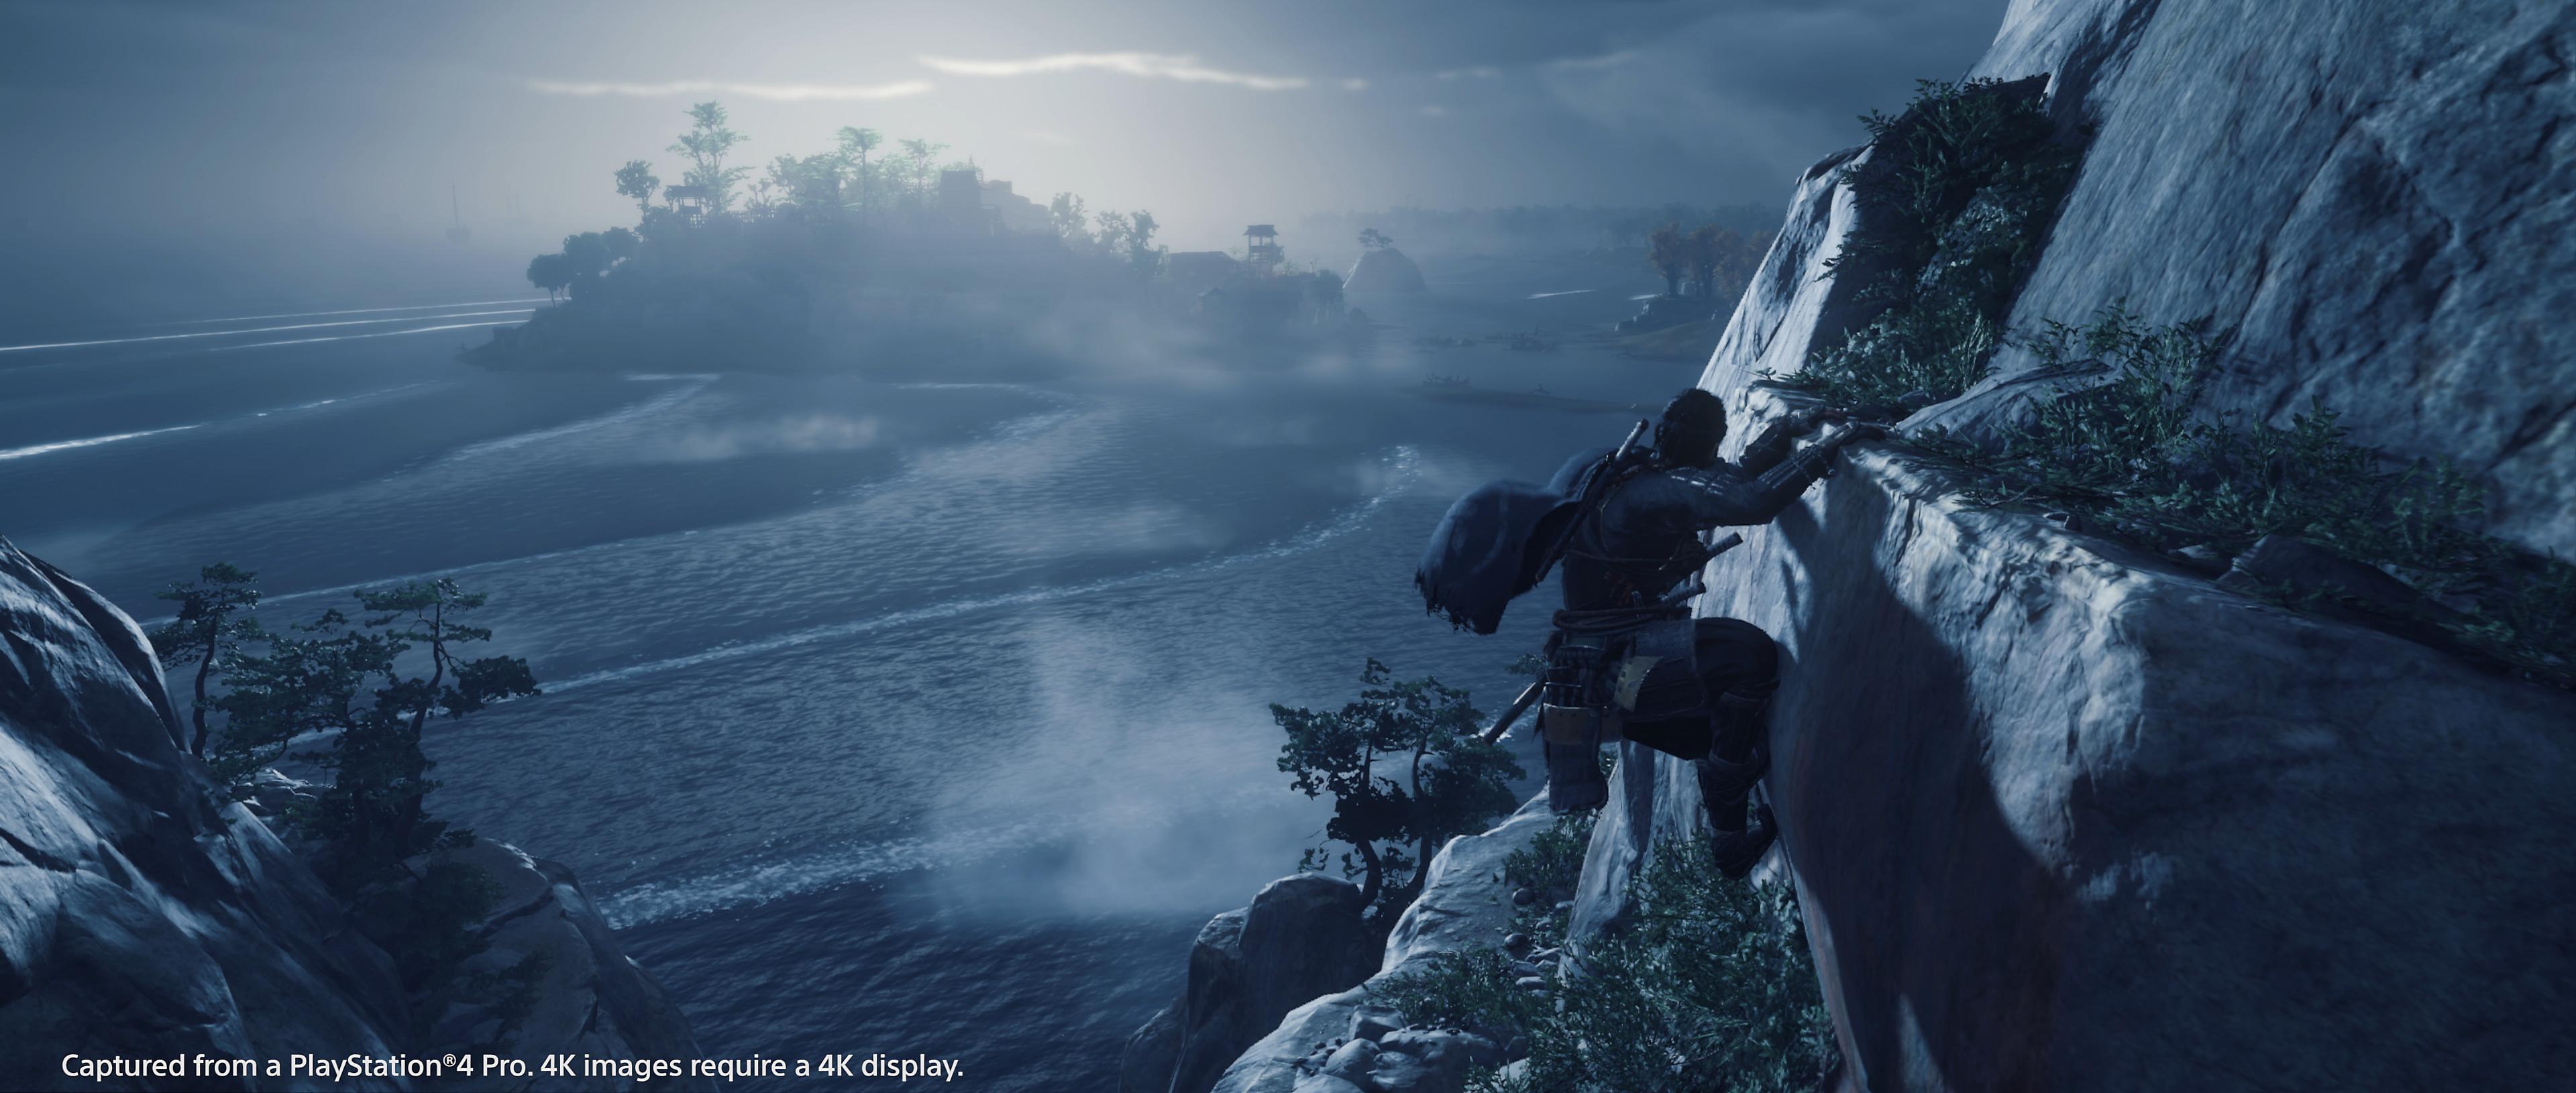 Ghost of Tsushima HDR image